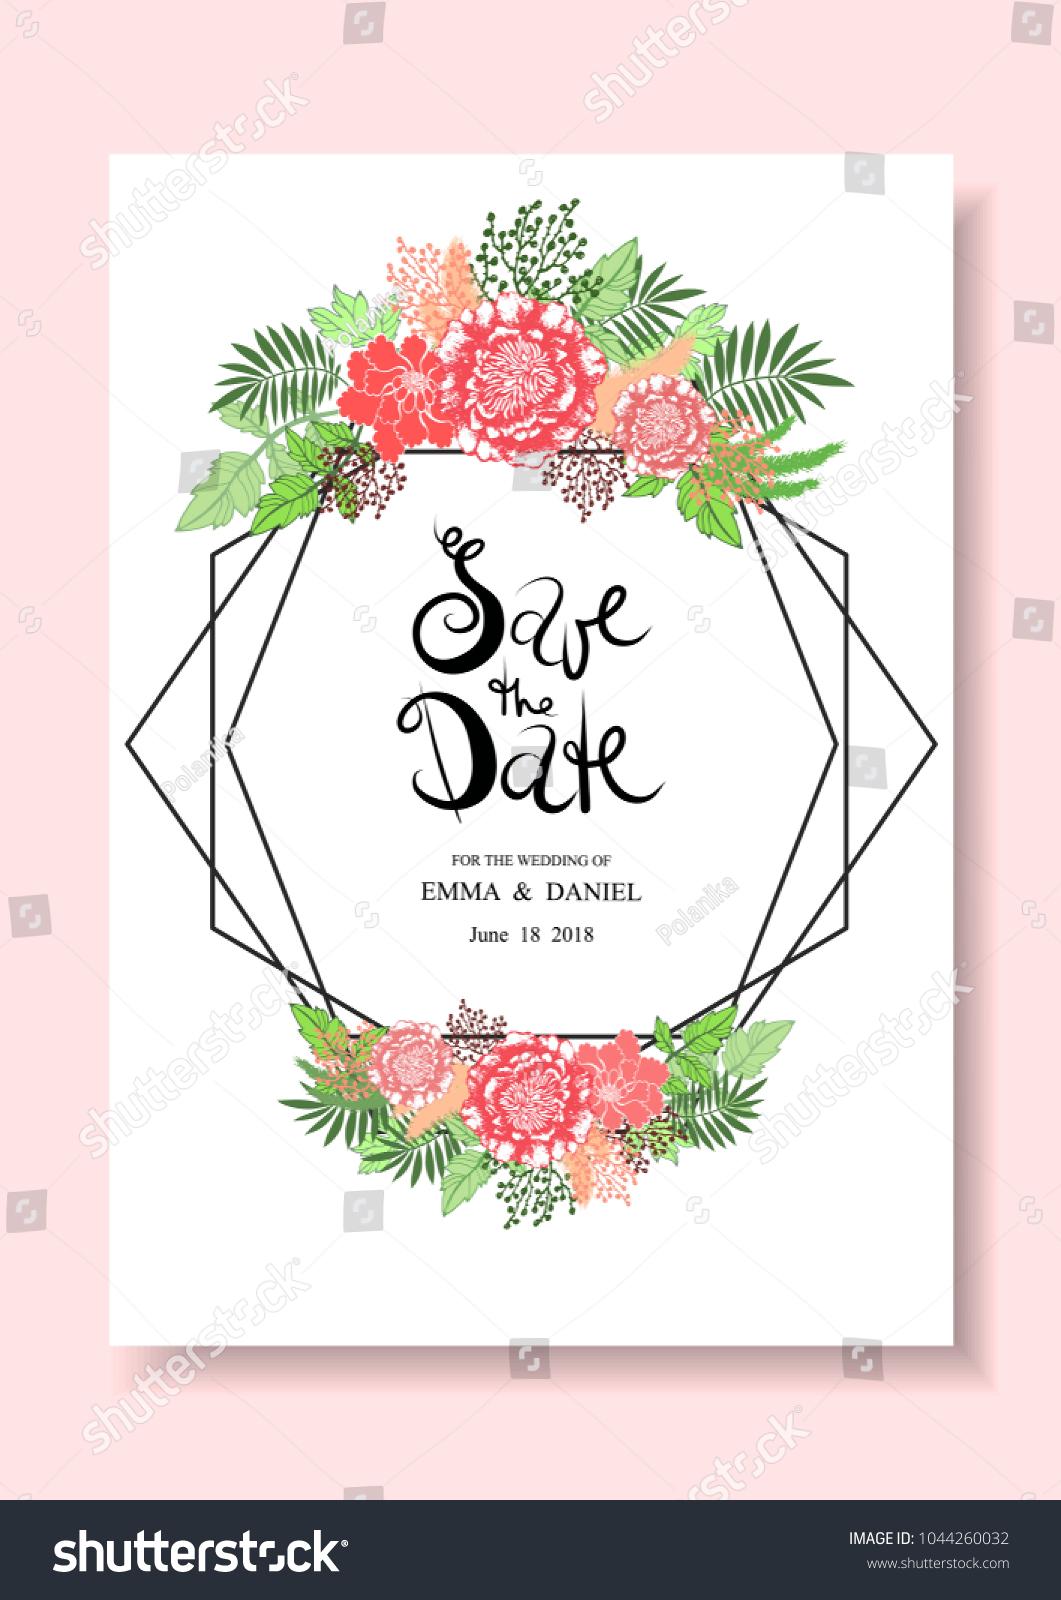 Wedding Invitation Card Vector Floral Romantic Stock Photo (Photo ...